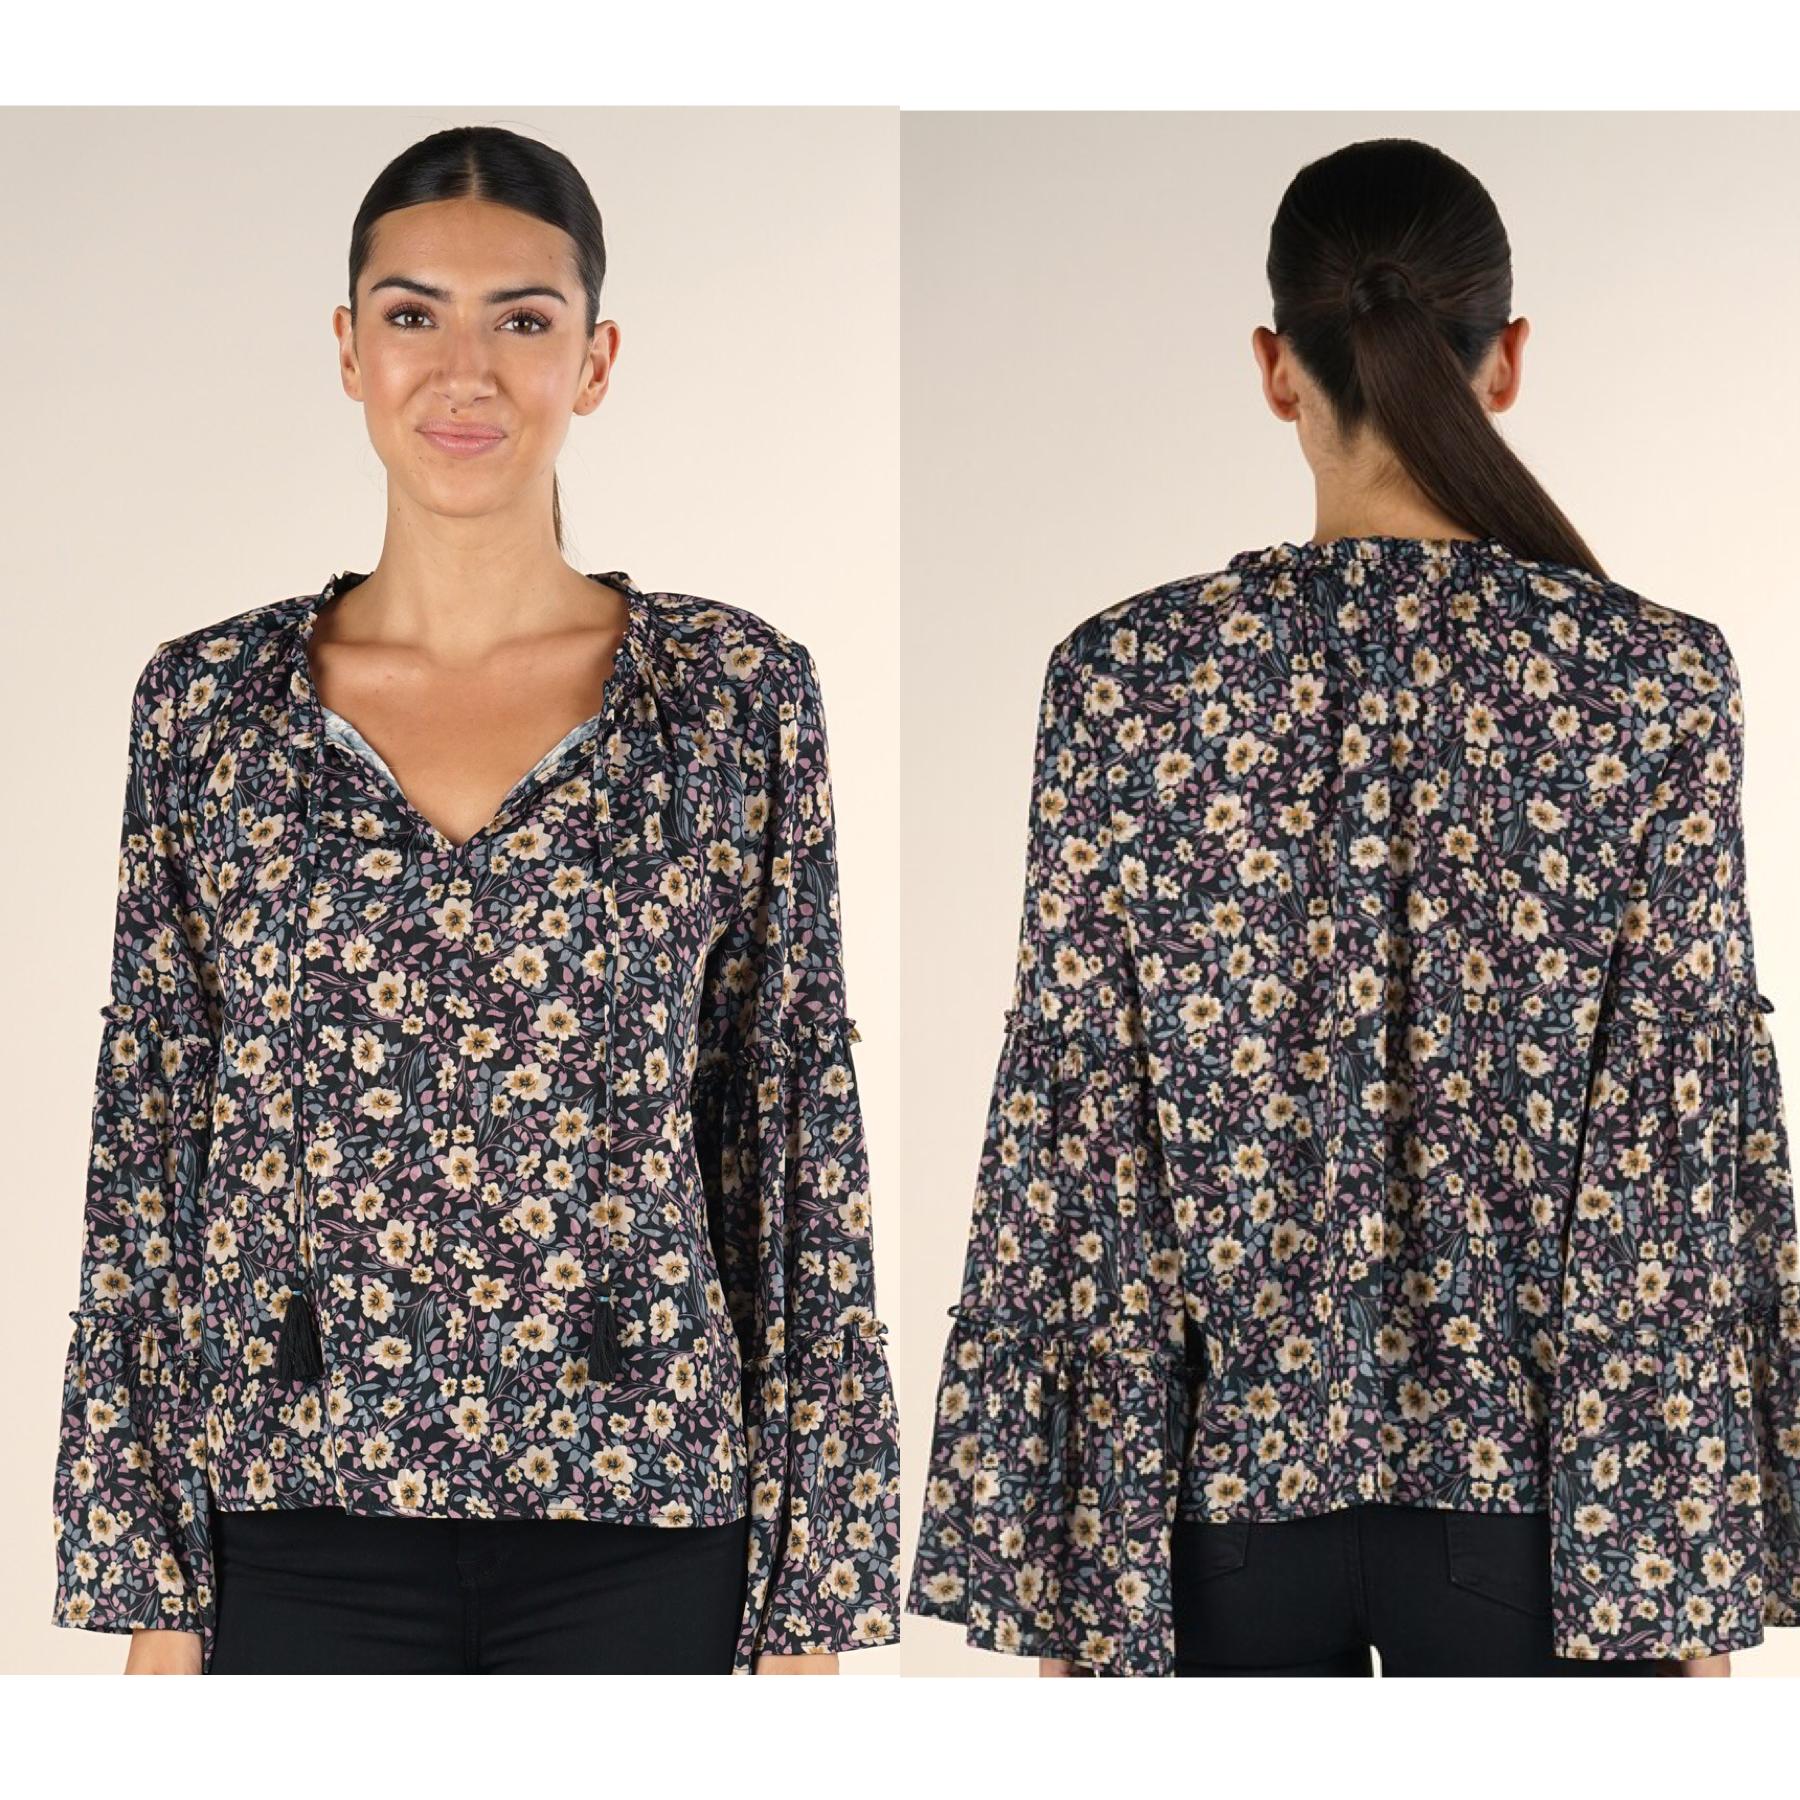 Floral Print Bell Sleeve Top